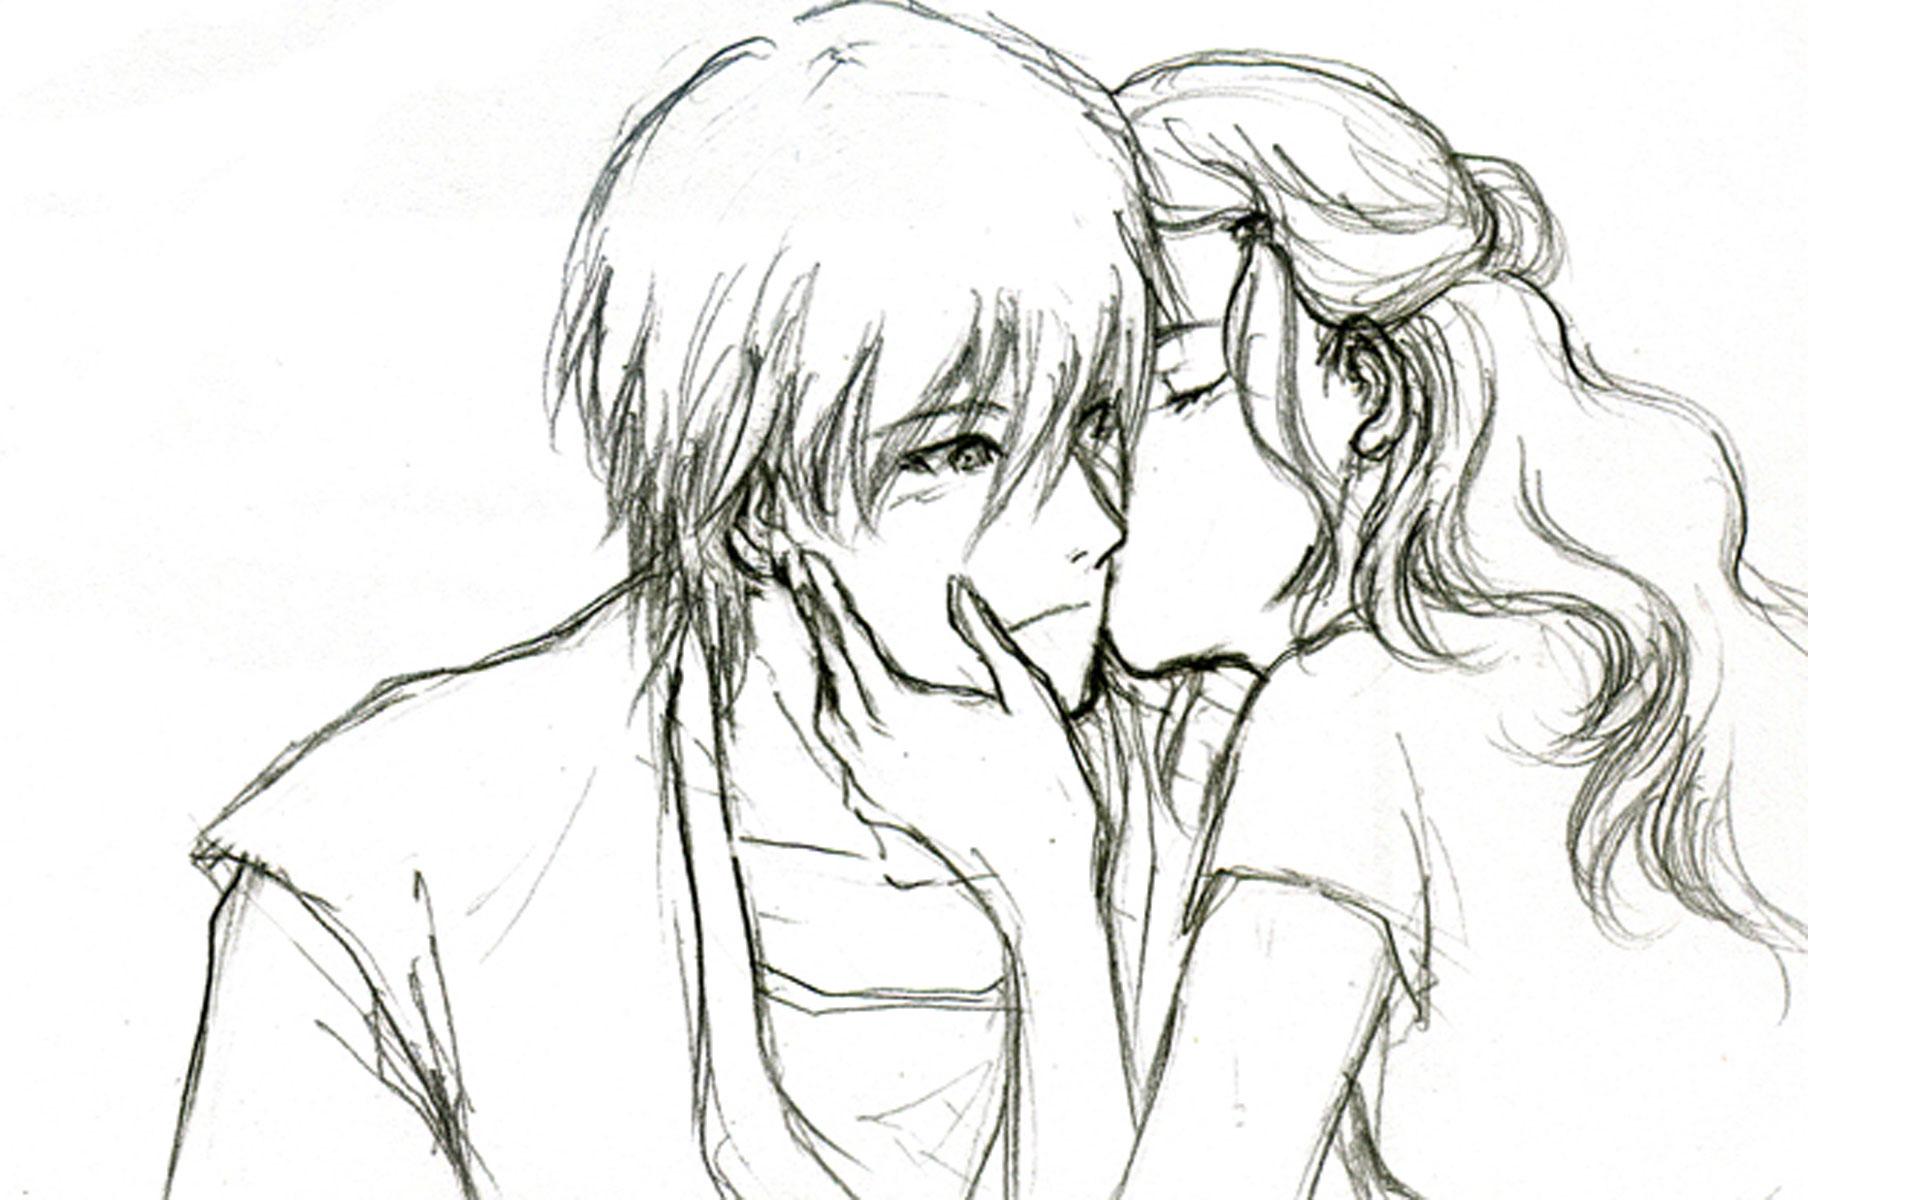 1920x1200 Pencil Sketch Images Of Love Cute Love Drawings Pencil Art Hd